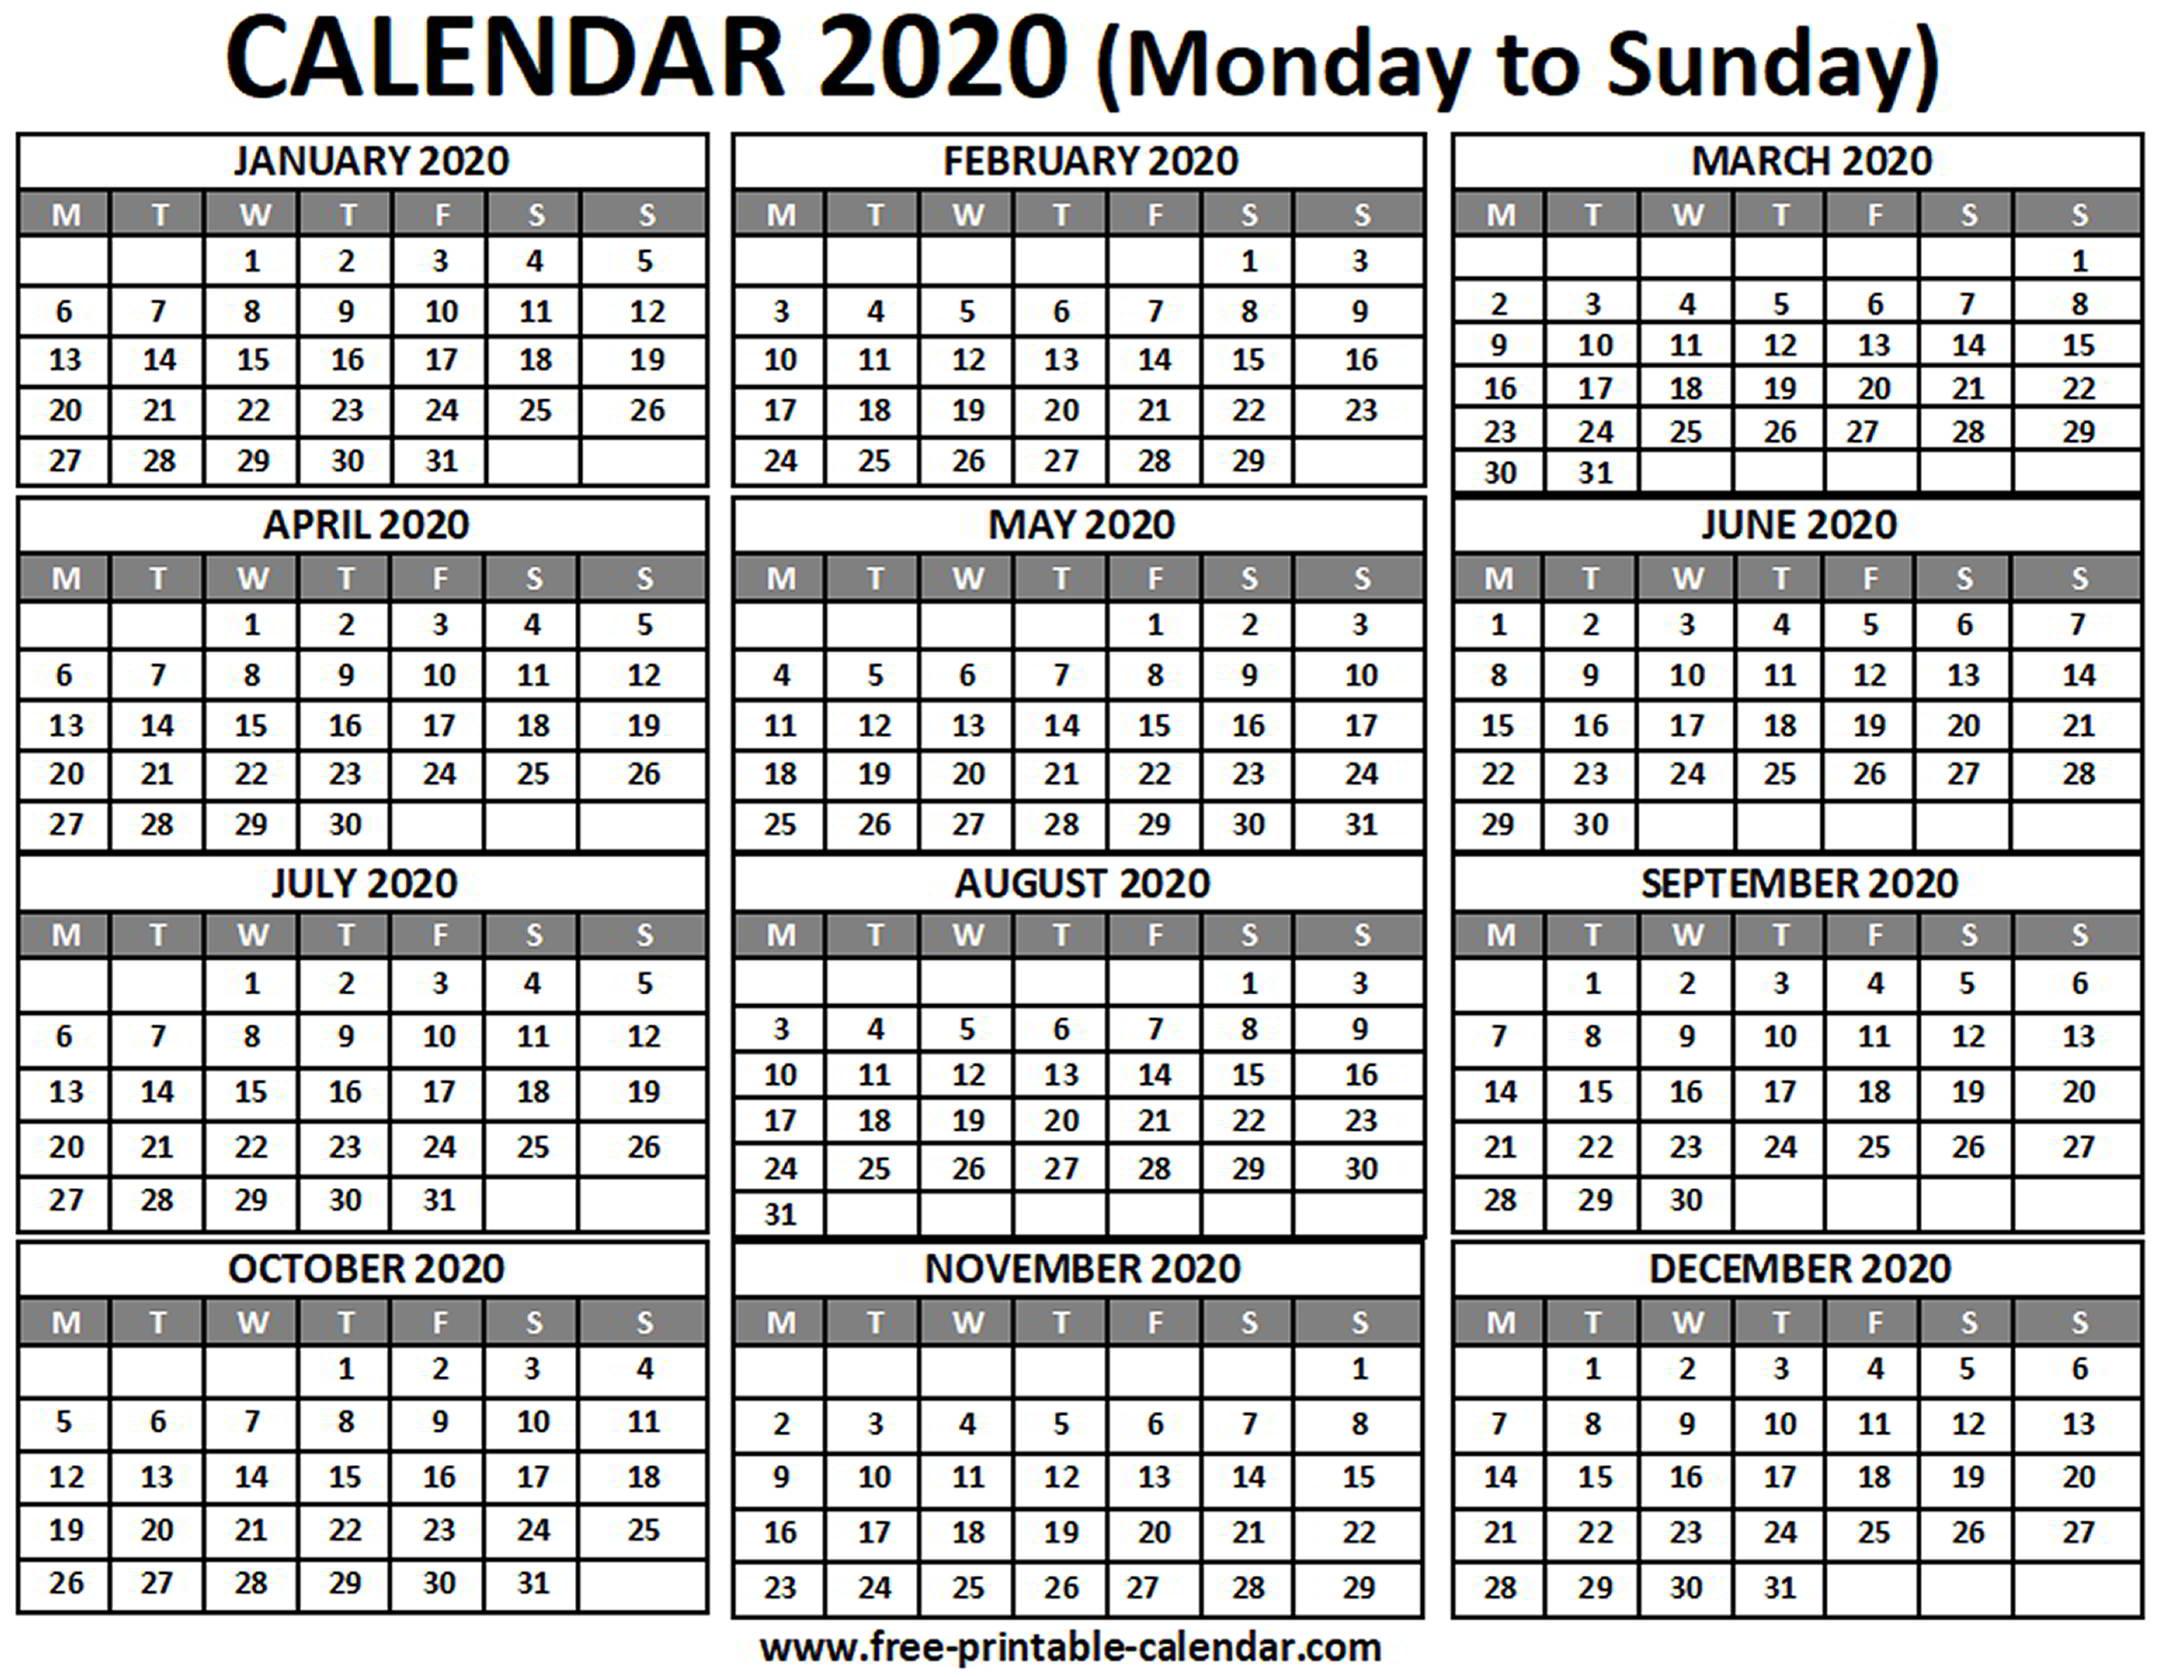 2020 Calendar - Free-Printable-Calendar for Printable Calendar2020 Monday To Sunday